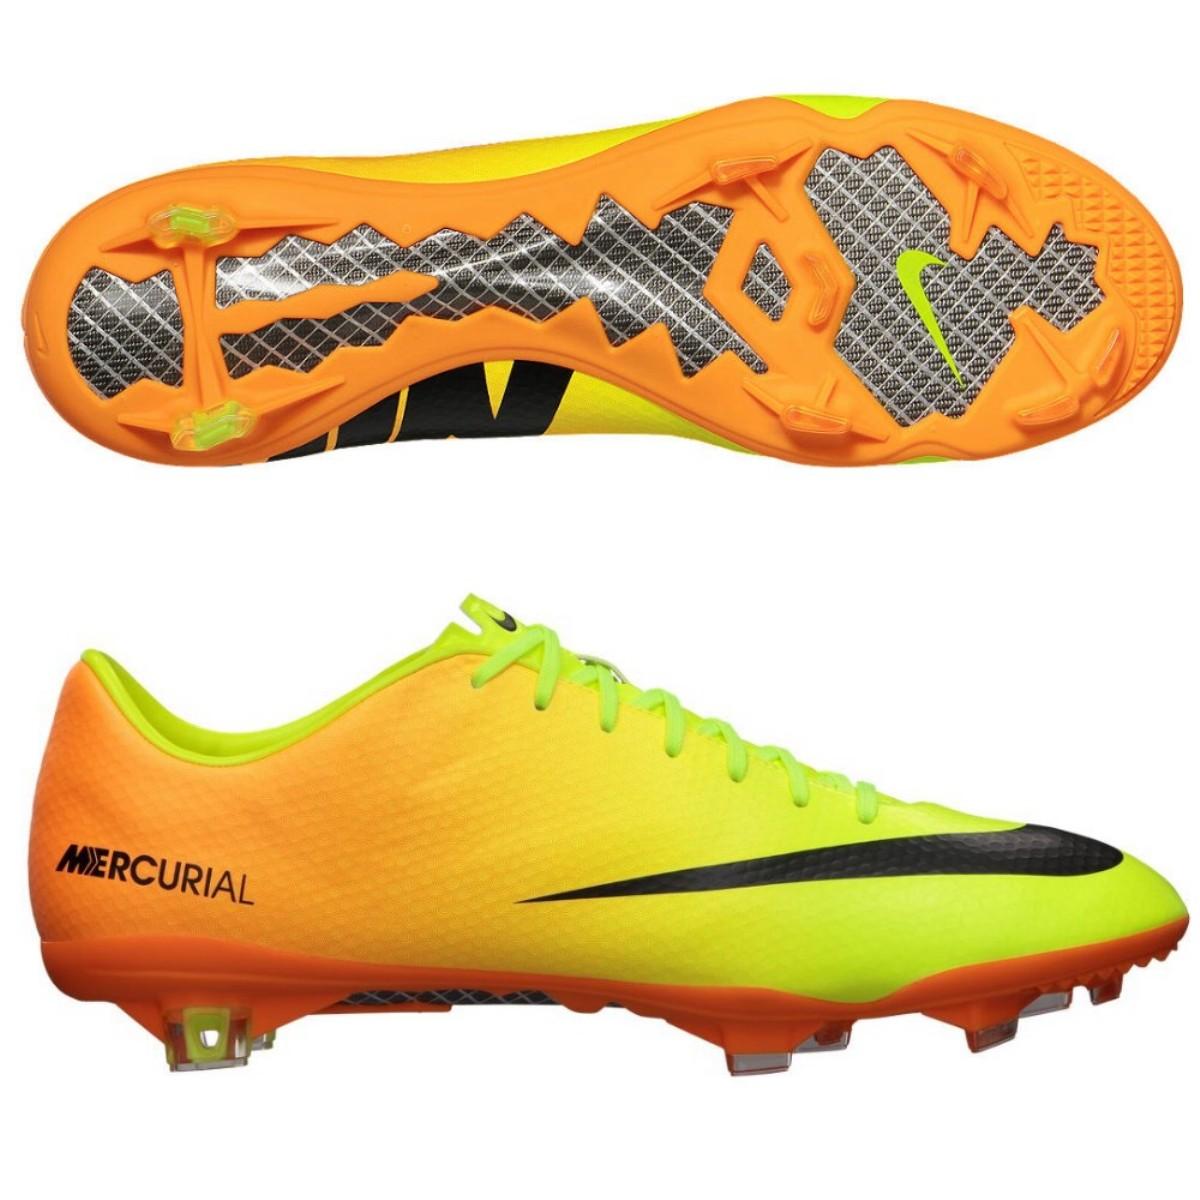 nike mercurial vapor ix fg shoes soccer shoes yellow cam. Black Bedroom Furniture Sets. Home Design Ideas